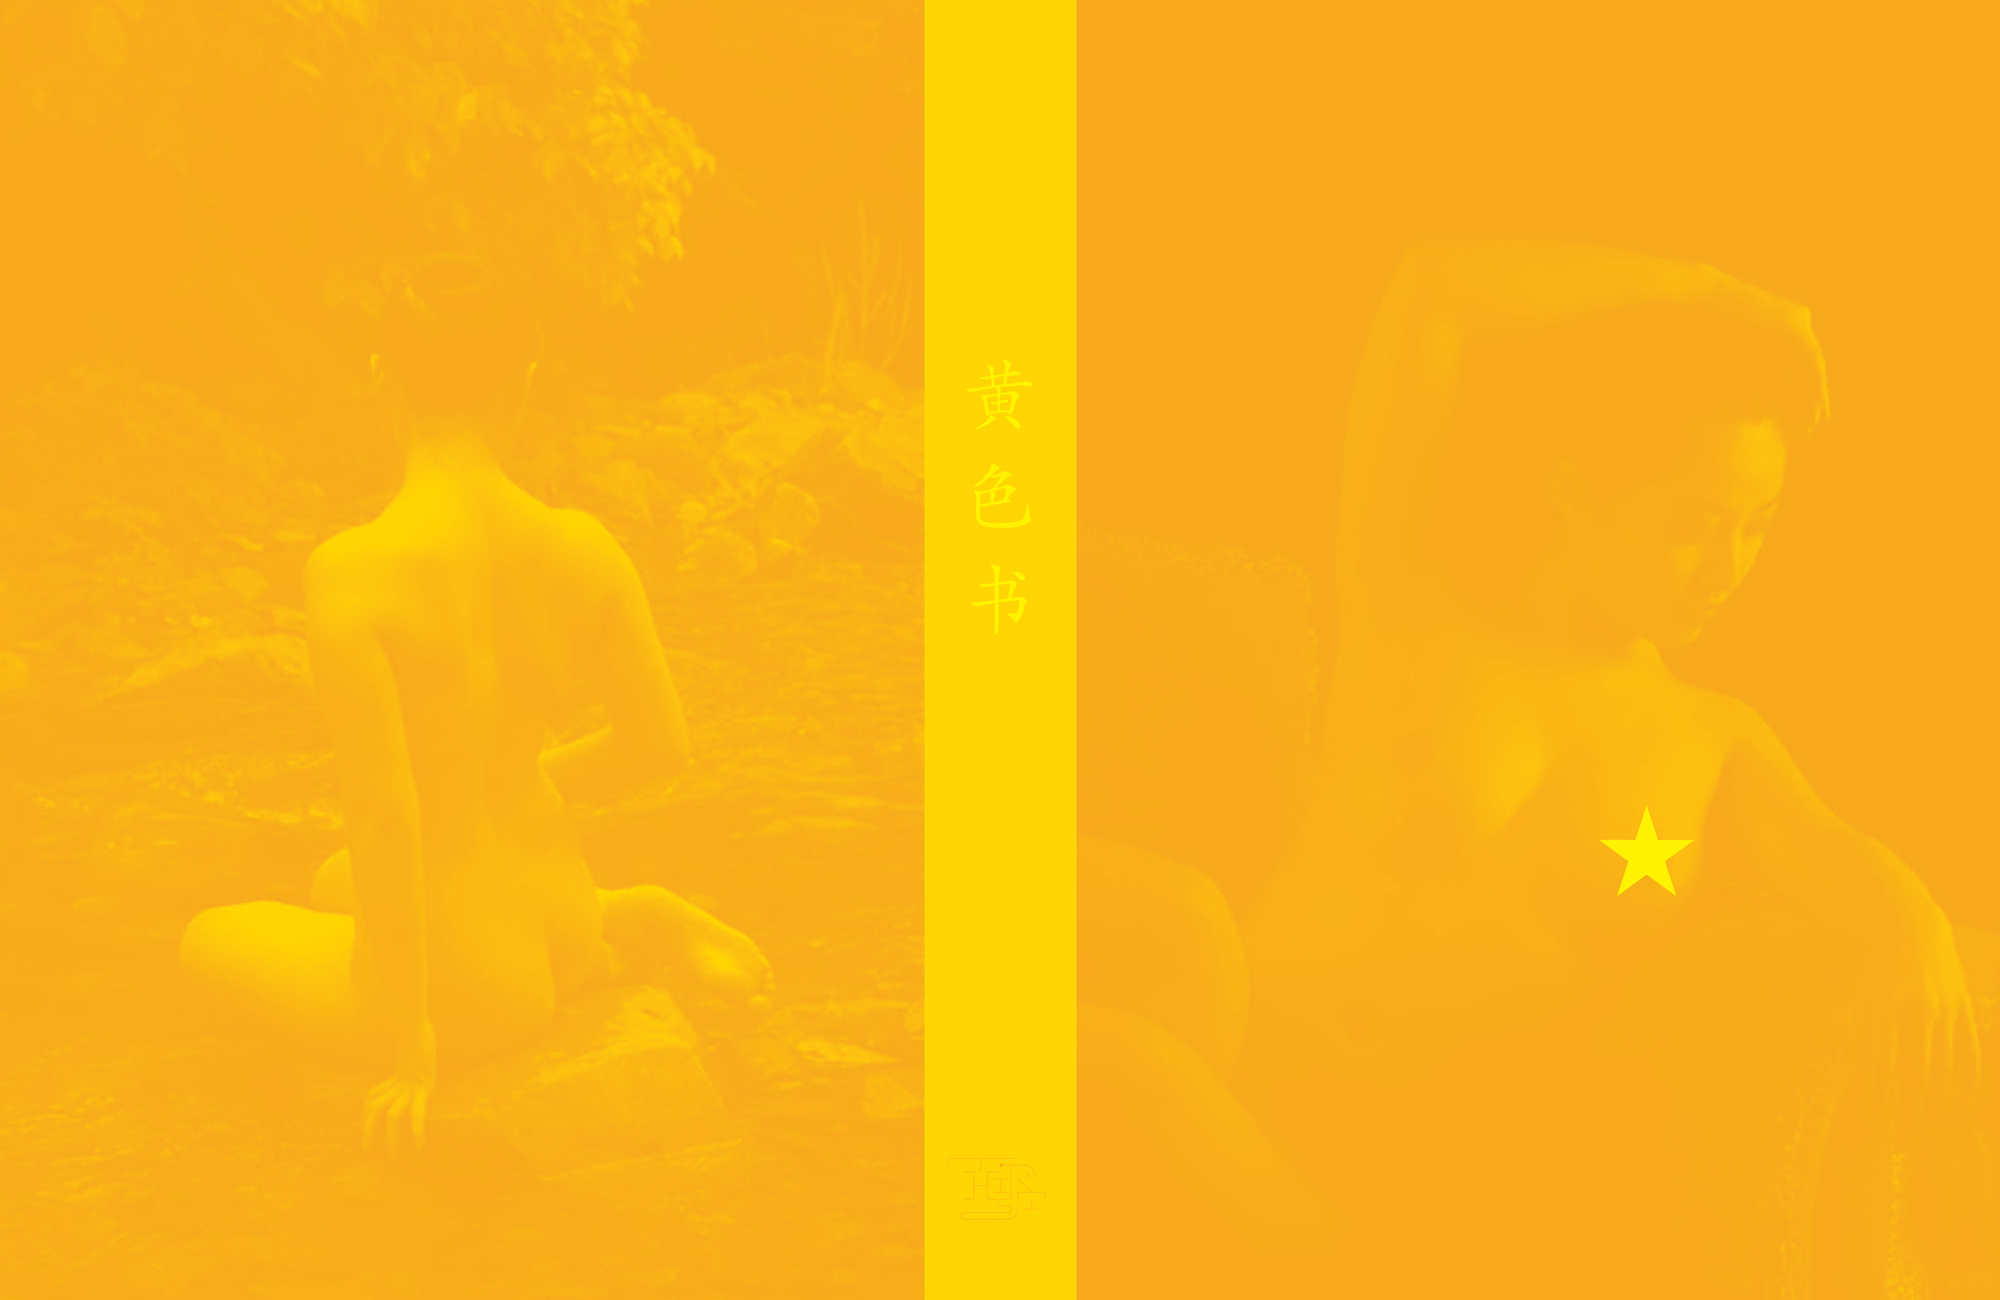 yellowbook-cover-1.jpg